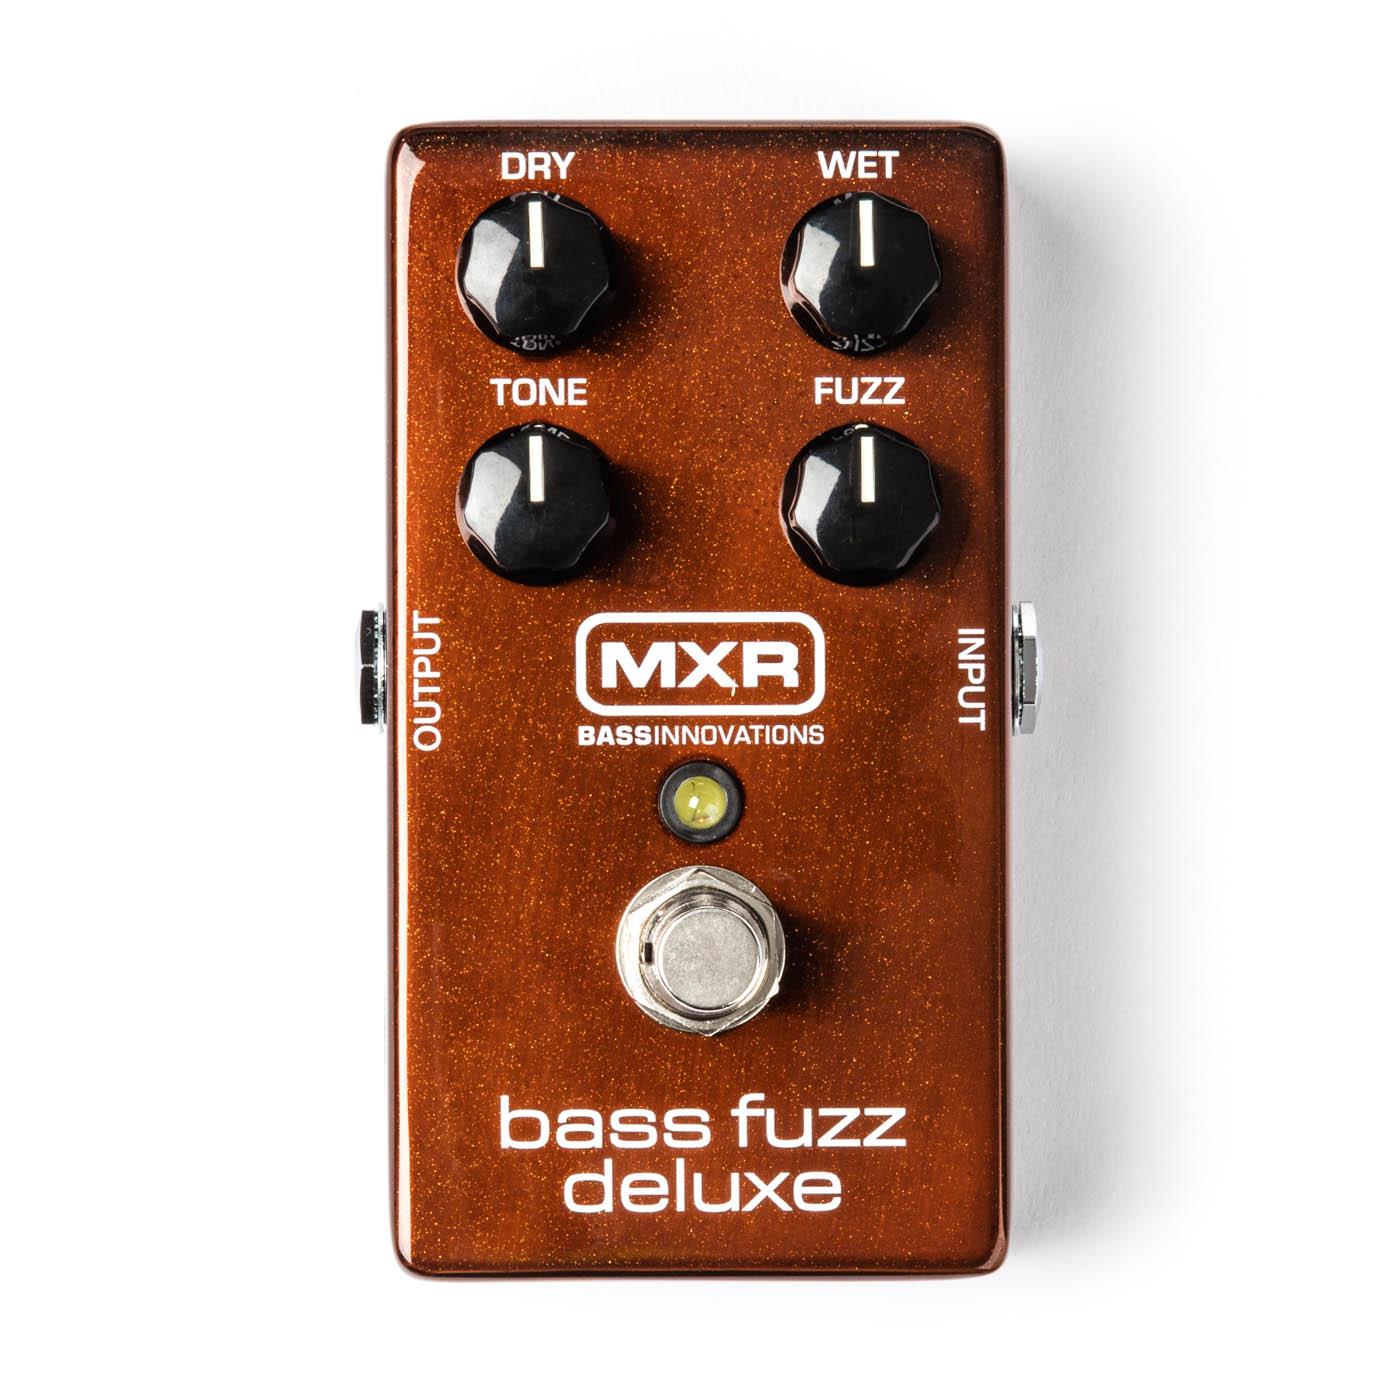 MXR Pedals M84 Bass Fuzz Deluxe Pedal M84